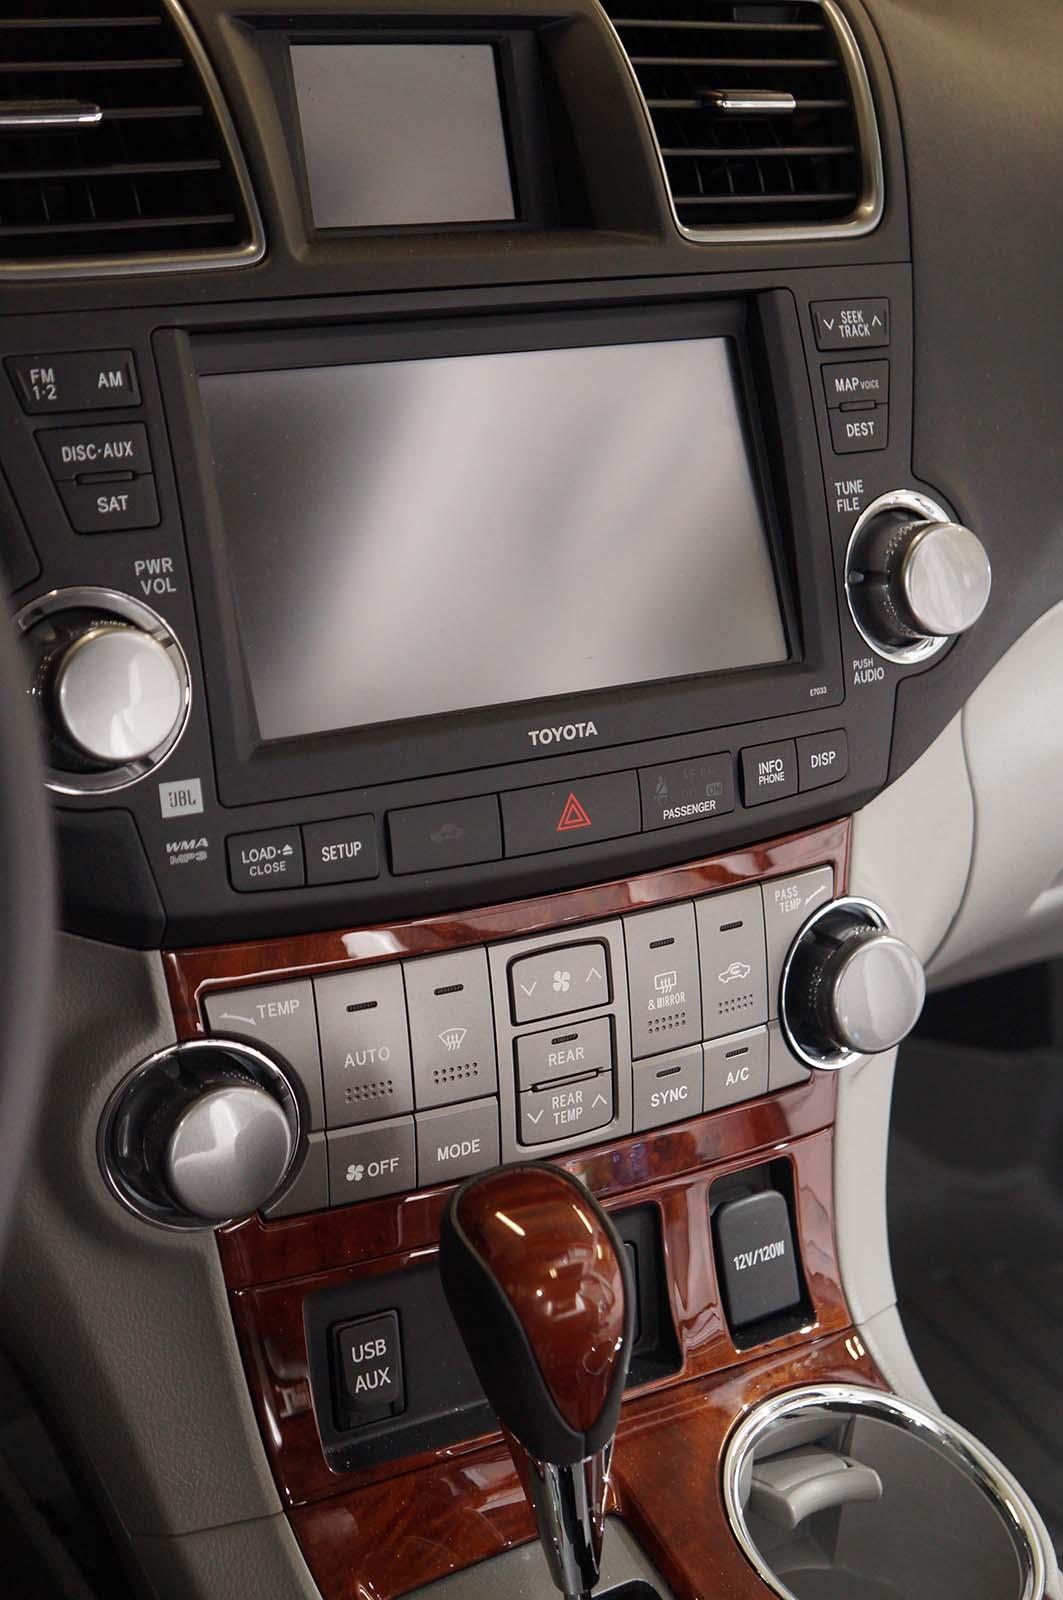 2012 Toyota Highlander nav by Sarah Franzen